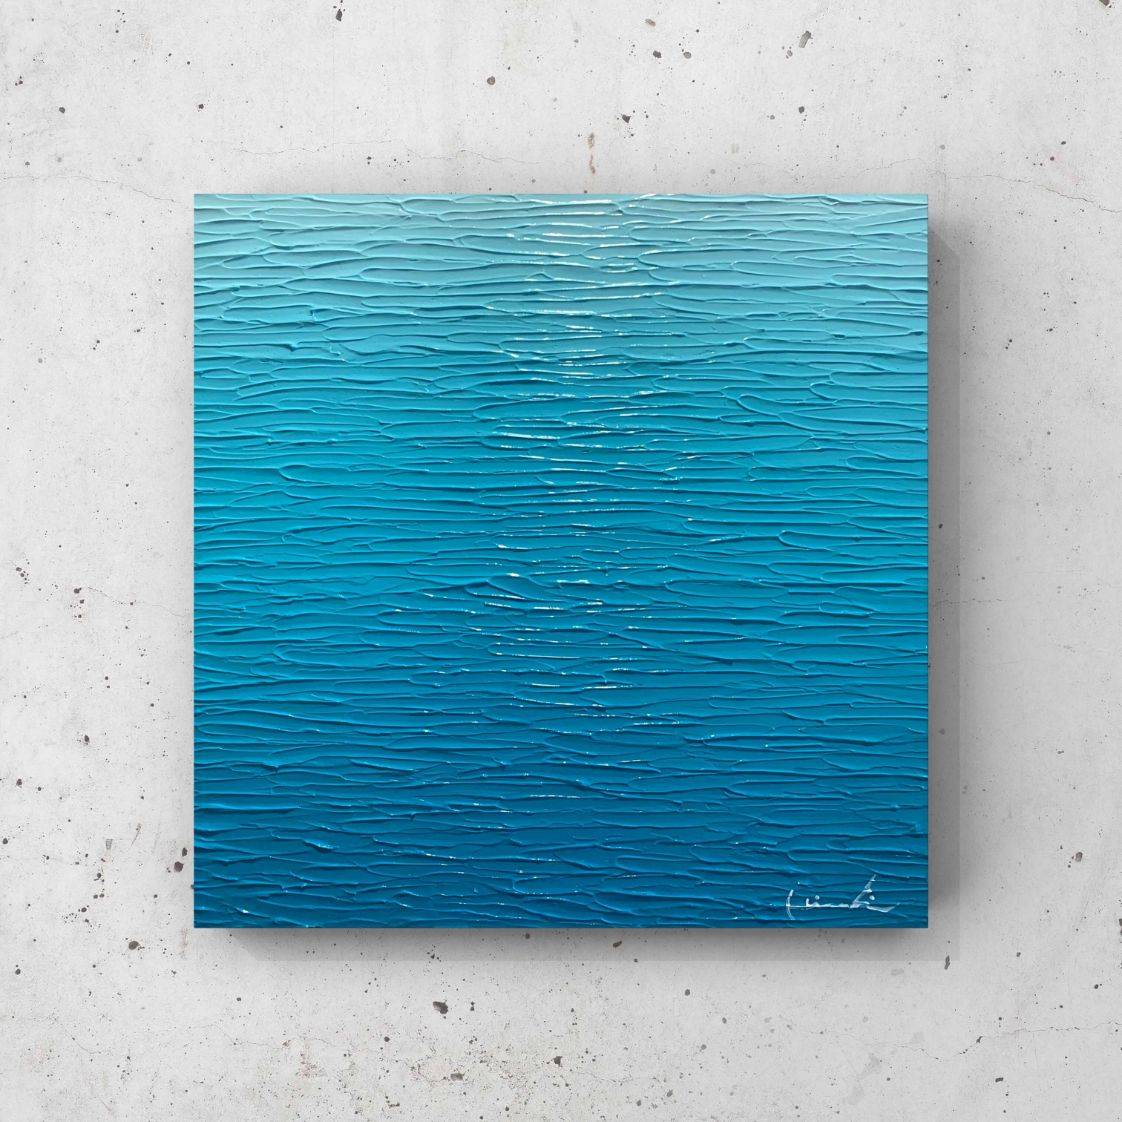 【The shape of ocean.(S-#5)】